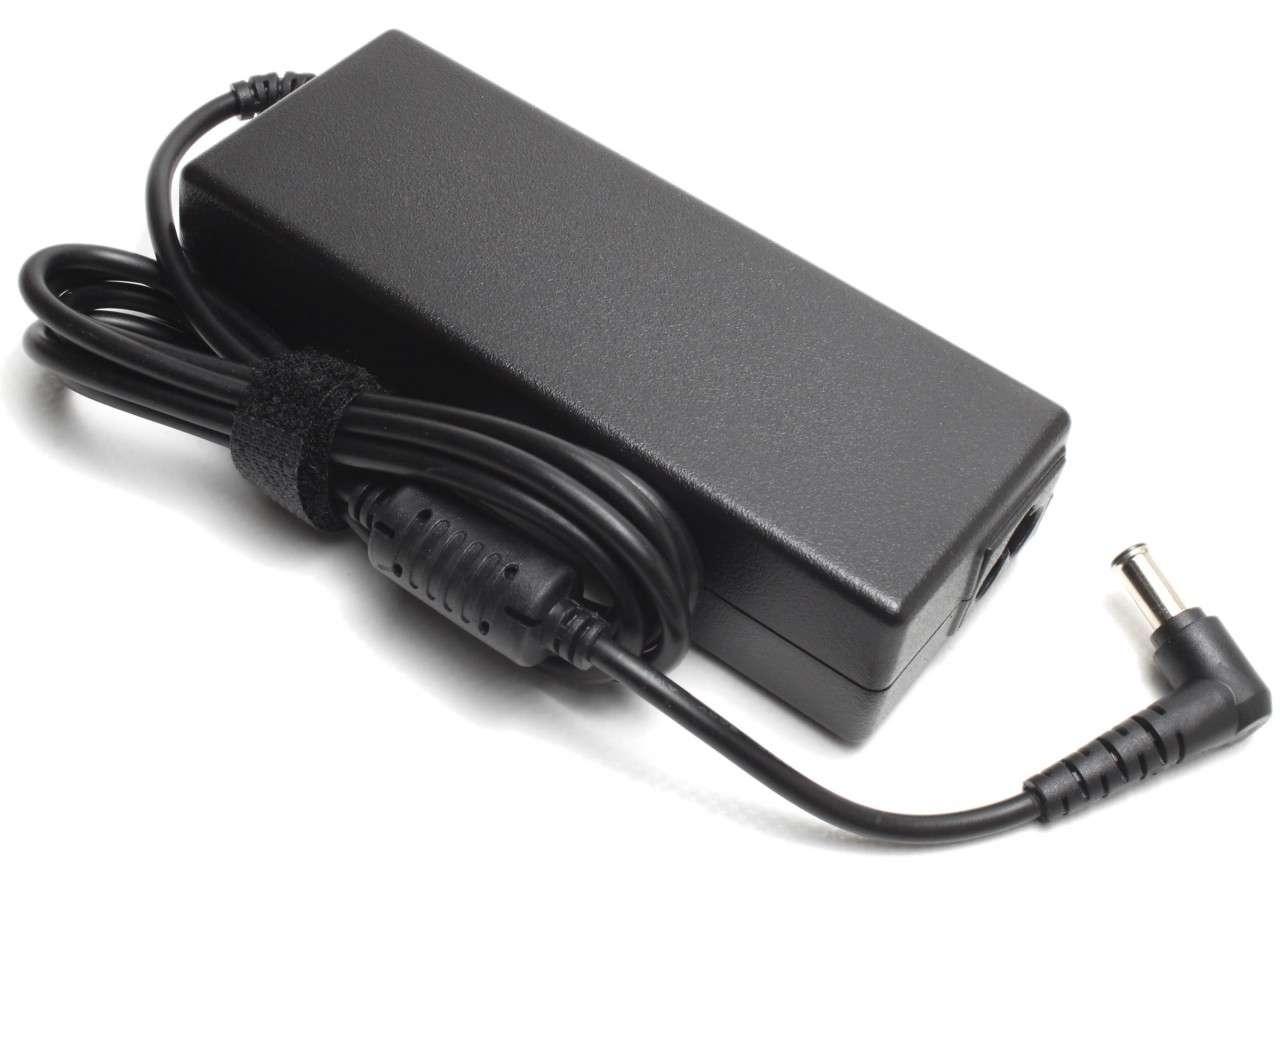 Incarcator Sony Vaio VGN S4HP Replacement imagine powerlaptop.ro 2021